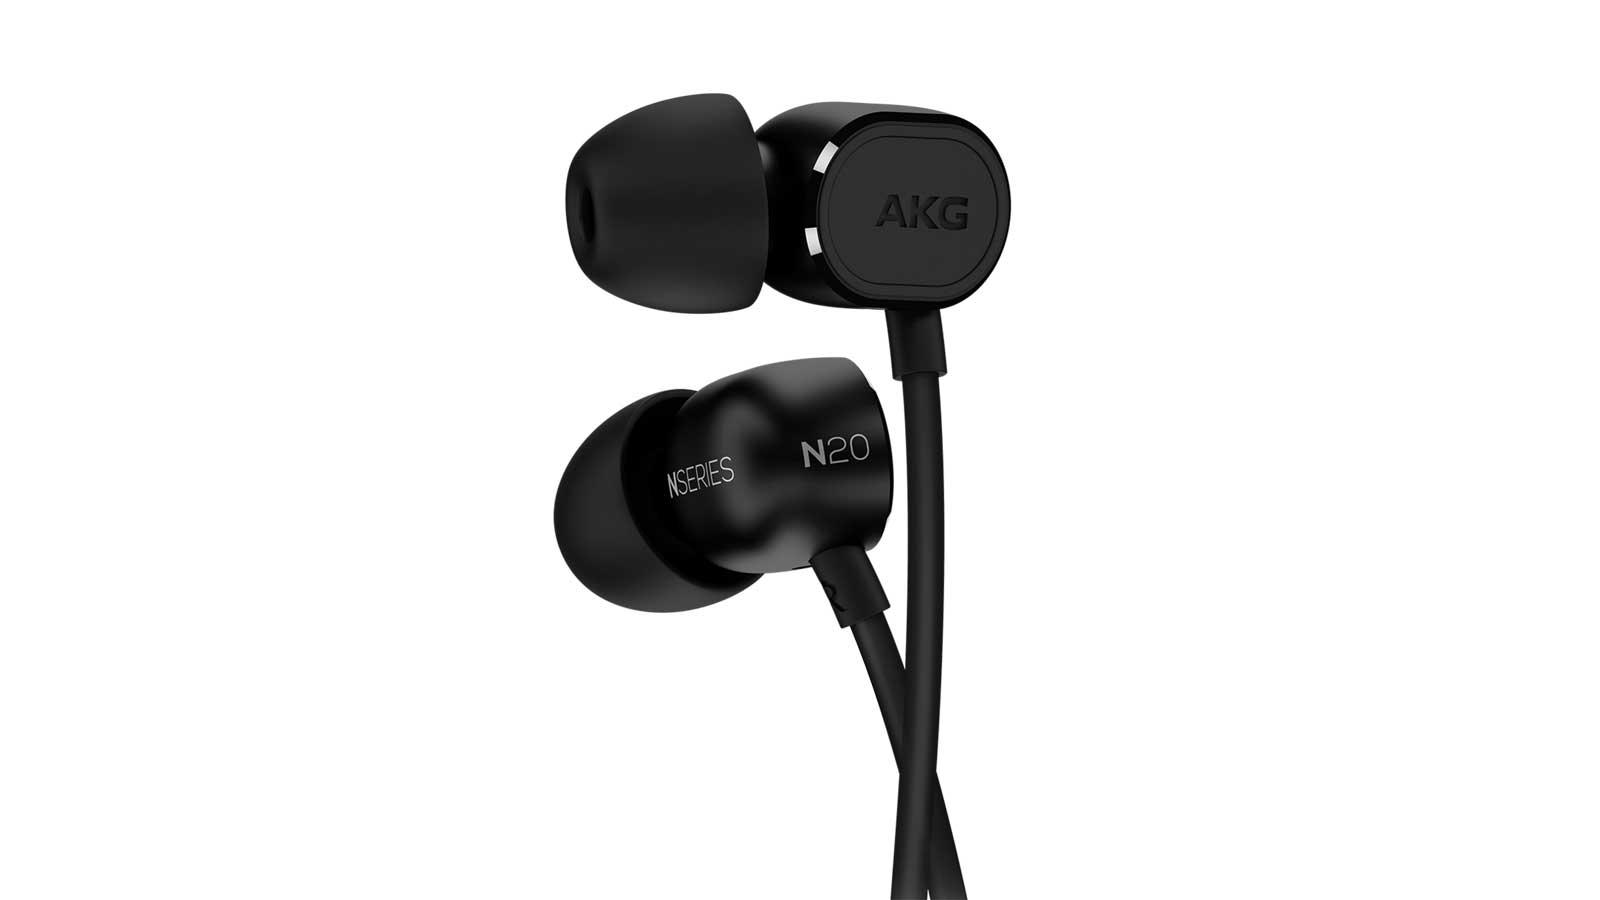 Test  AKG N20 - Lätt och luftig hörlur - Digital Life a7e0762a44a54